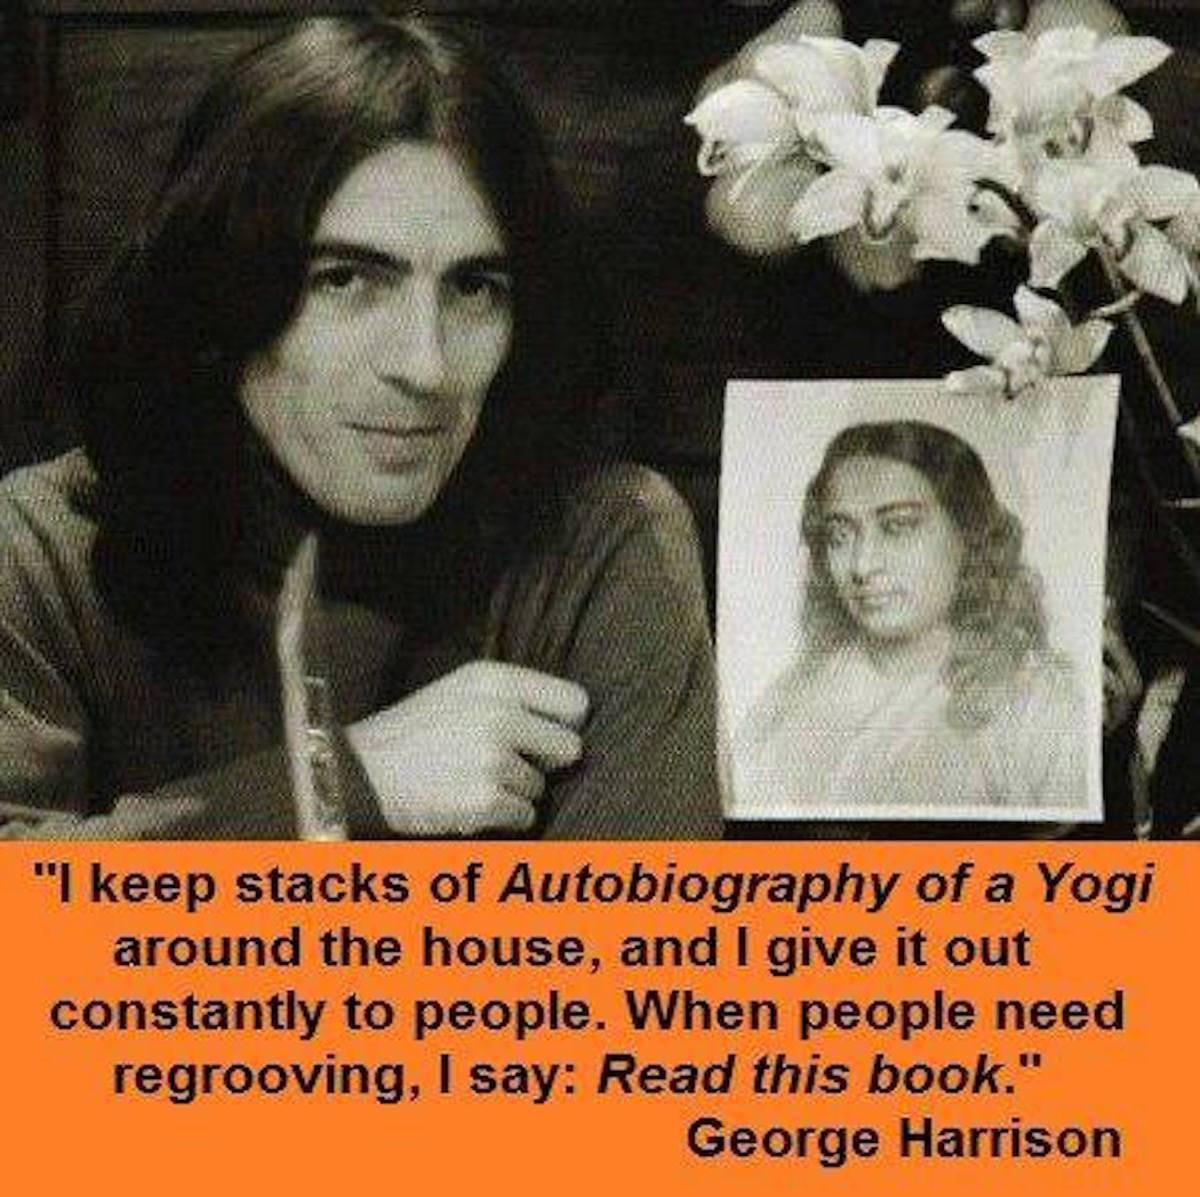 George Harrison & Photo of Guruji